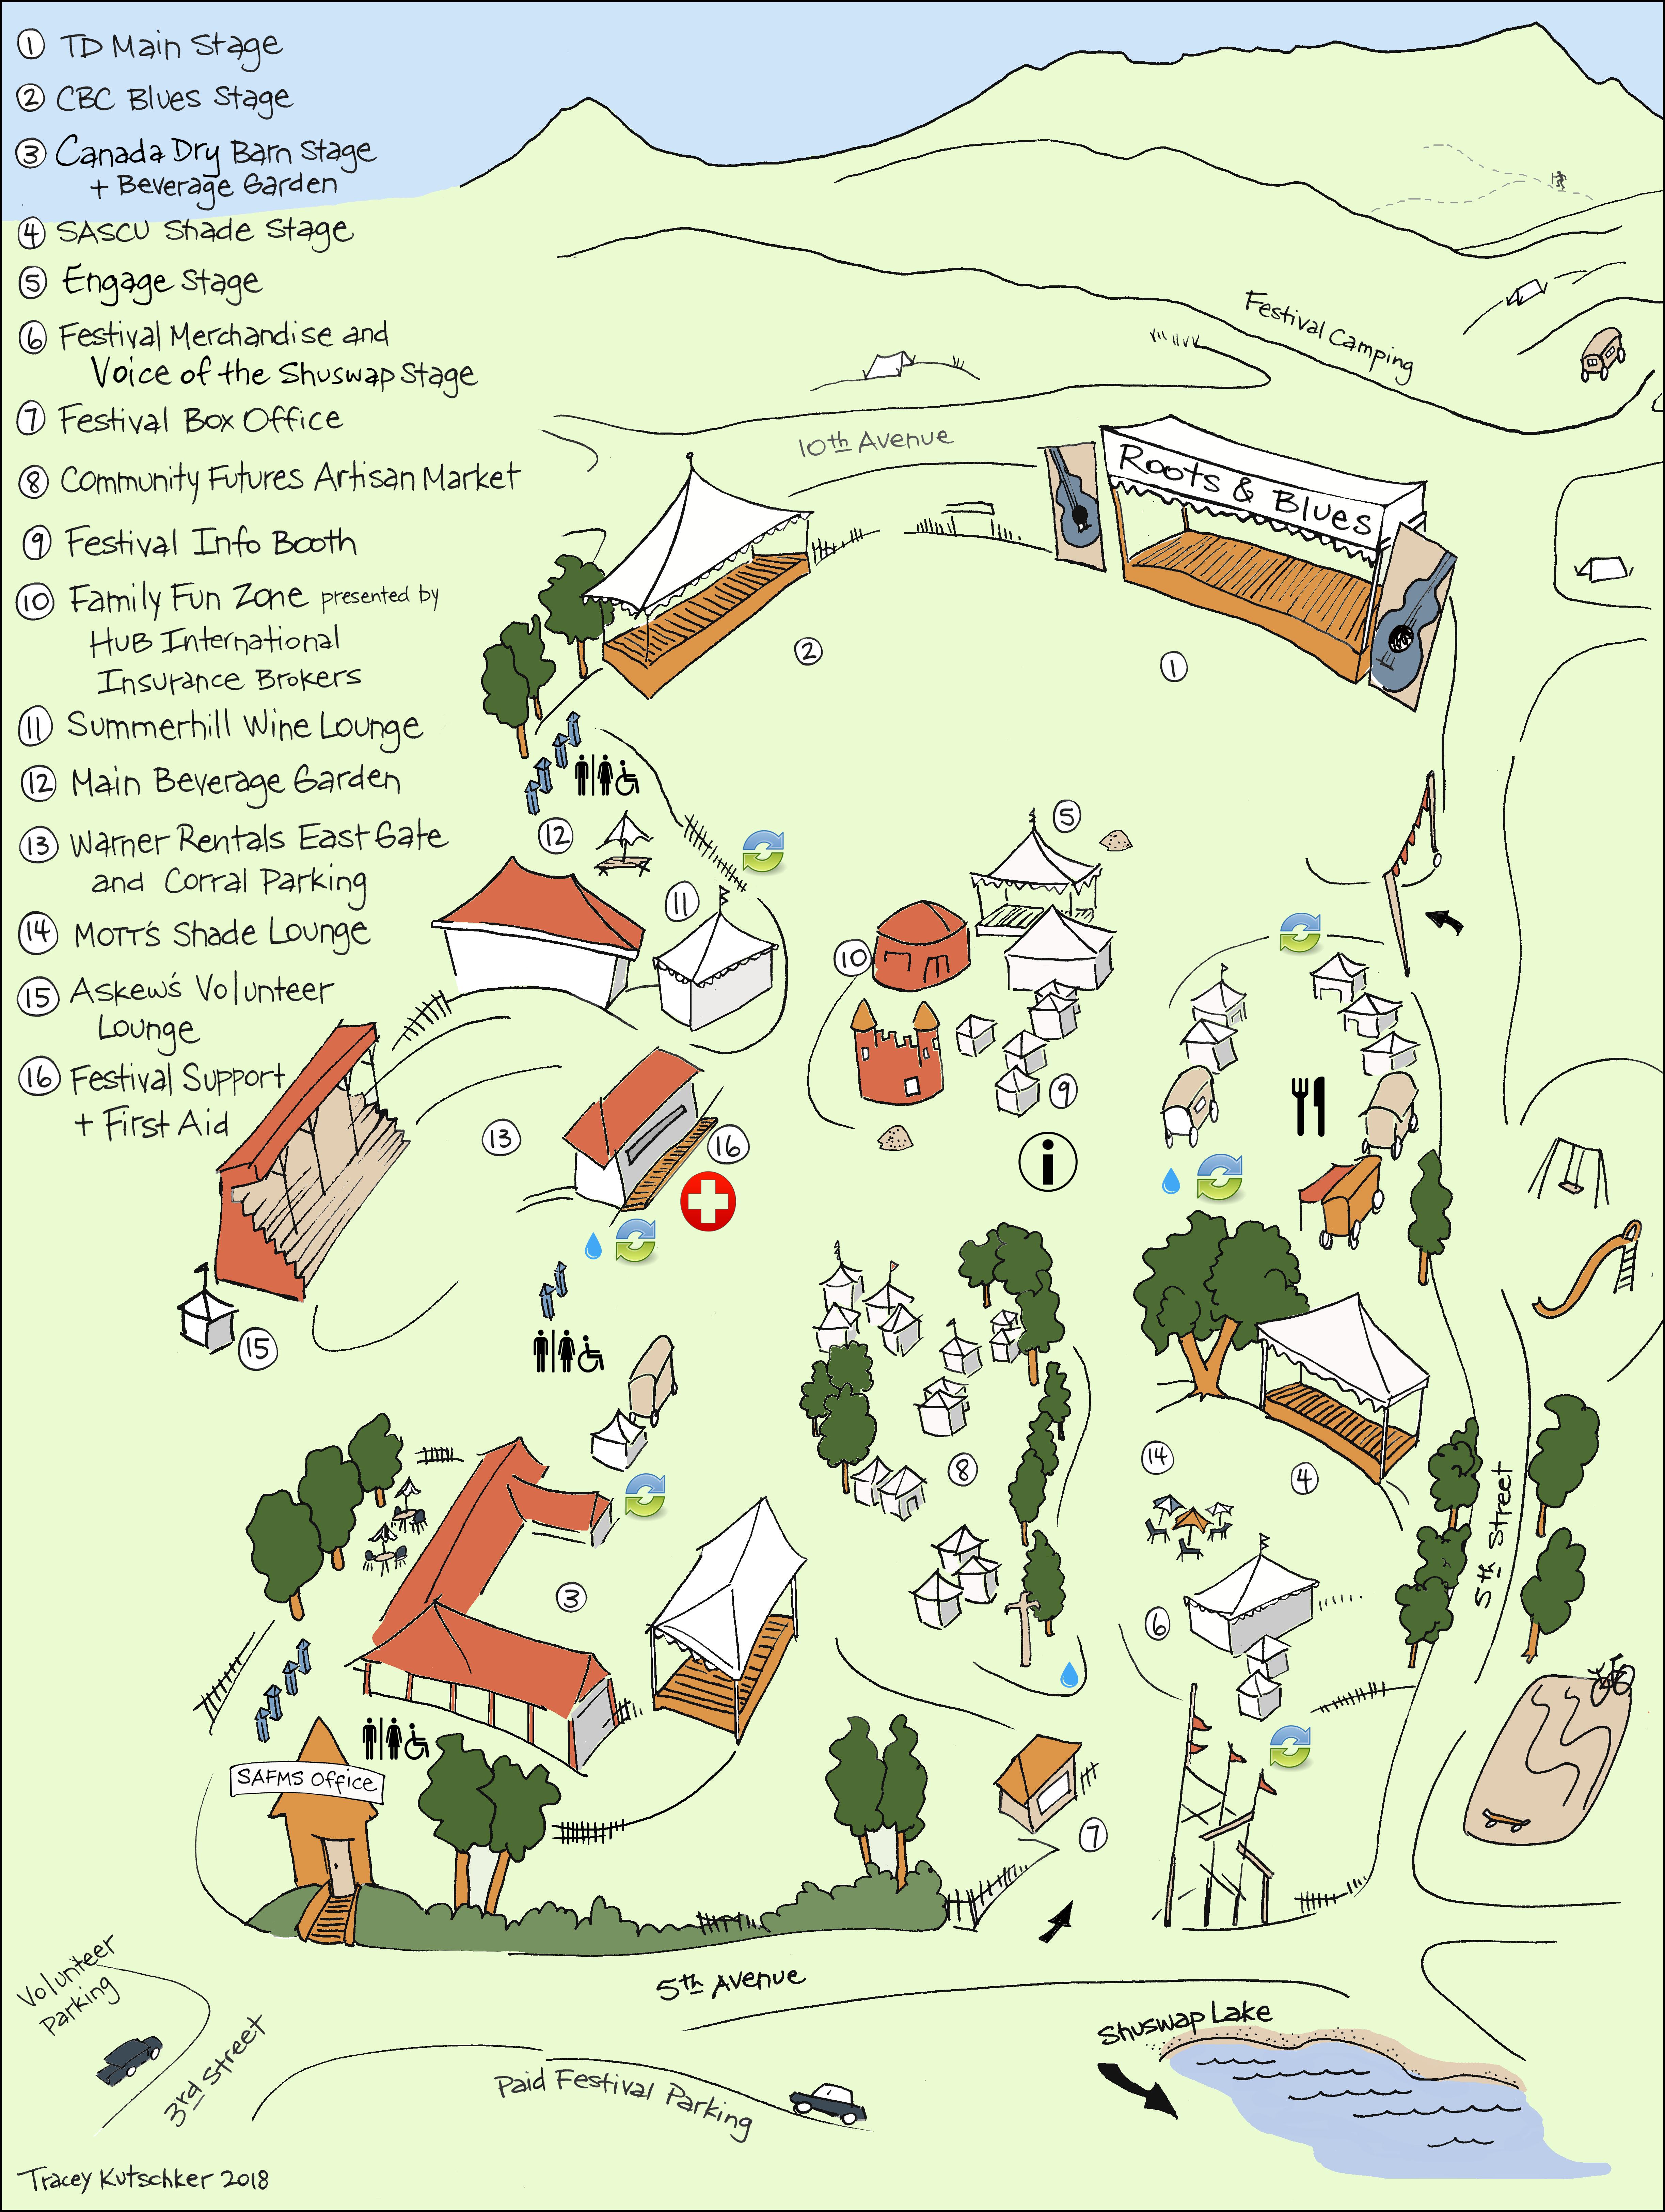 Maps | ROOTSandBLUES Festival in Salmon Arm, British Columbia Map Directions Bc on manitoba map, nd map, nova scotia map, alberta map, vancouver map, ae map, victoria map, uk map, ontario map, washington map, ab map, usa map, canada map, txst map, yukon map, nunavut map, toronto map, alaska map, sleep map, nc map,